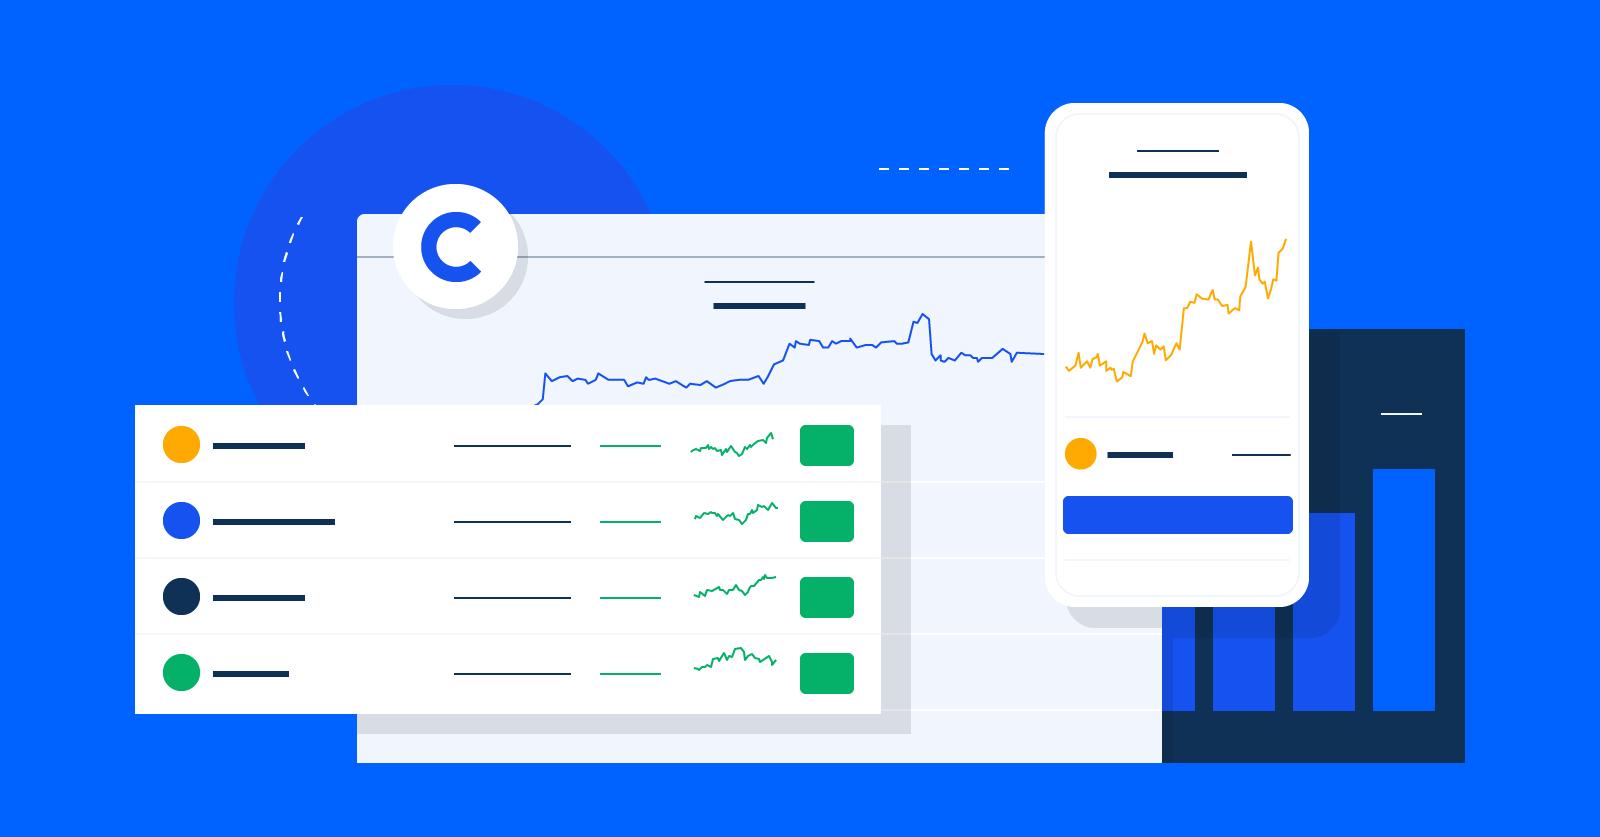 Coinbase Usage and Trading Statistics